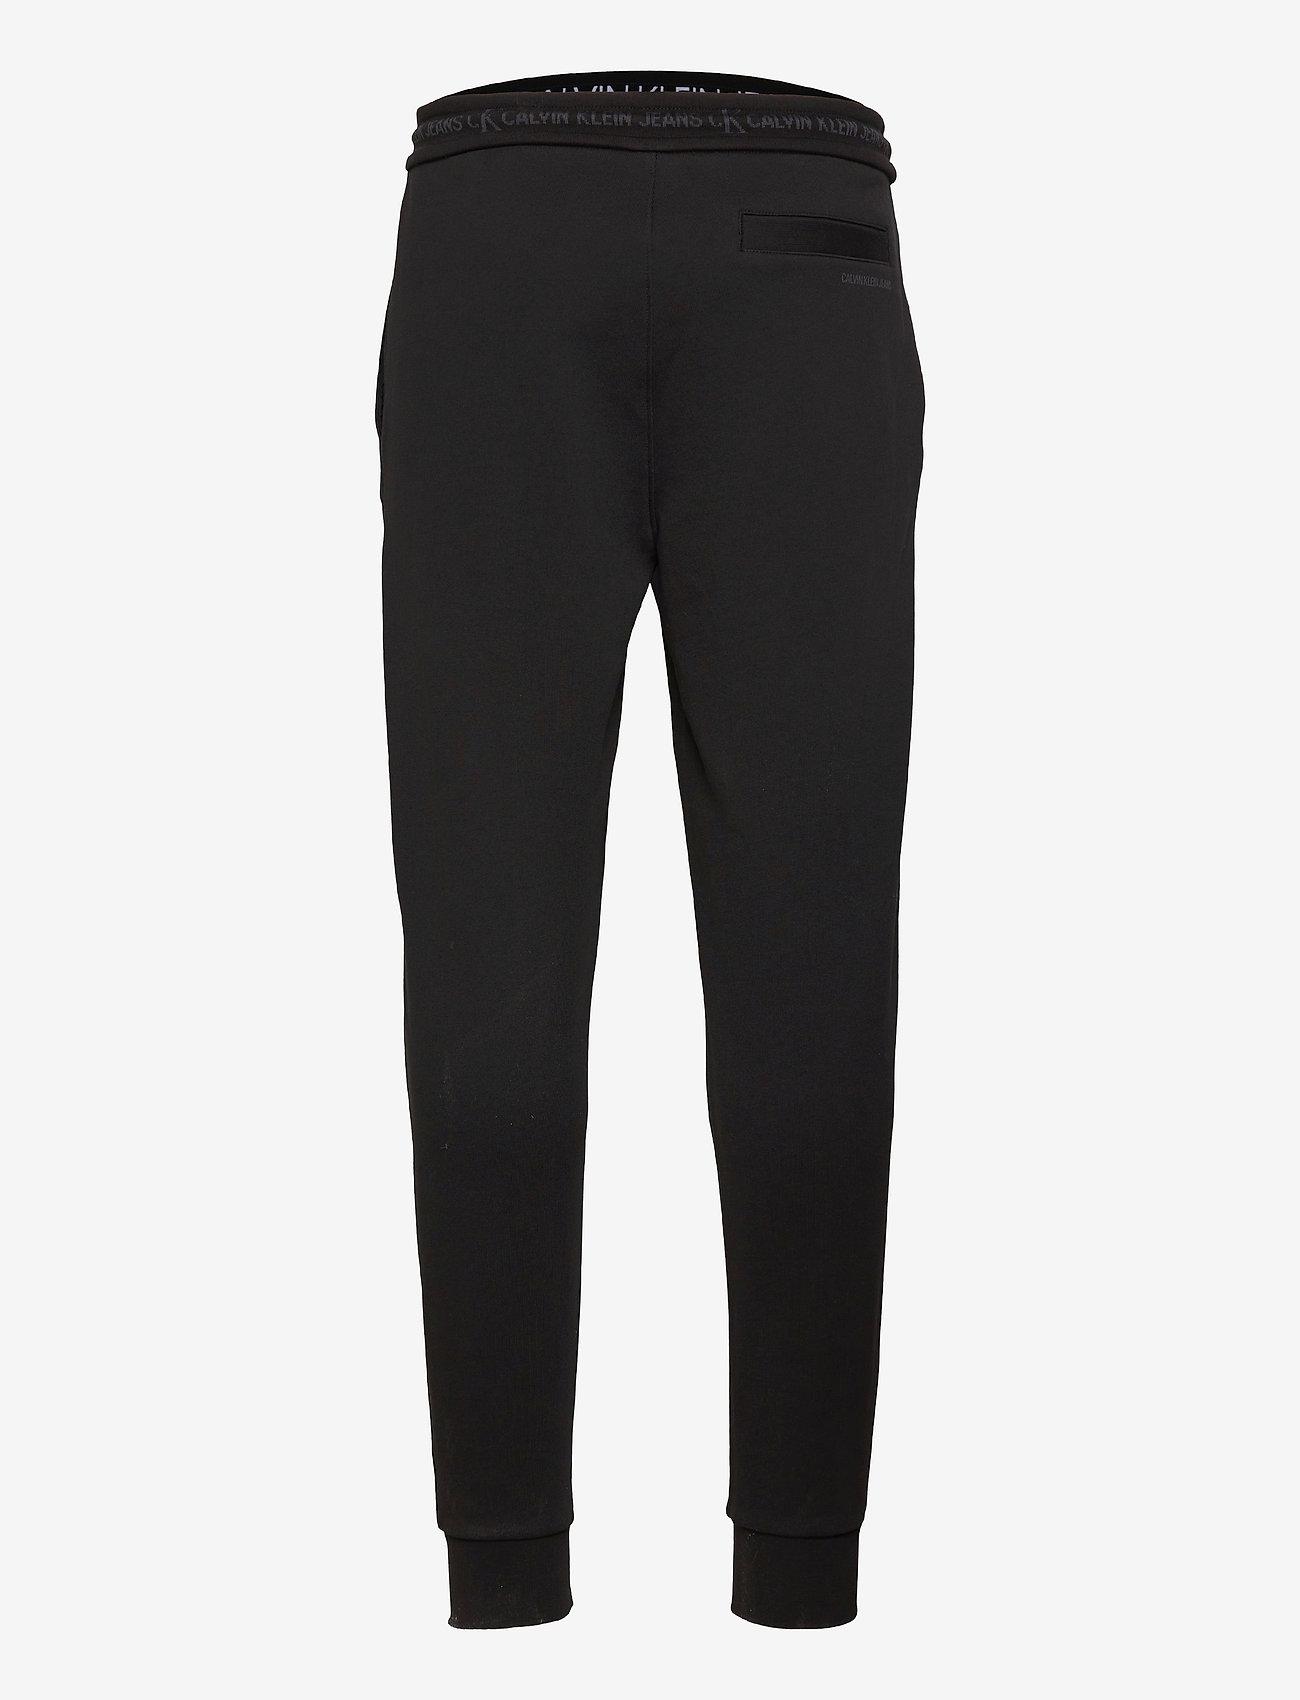 Calvin Klein Jeans - LOGO JACQUARD HWK PANT - kleding - ck black - 1